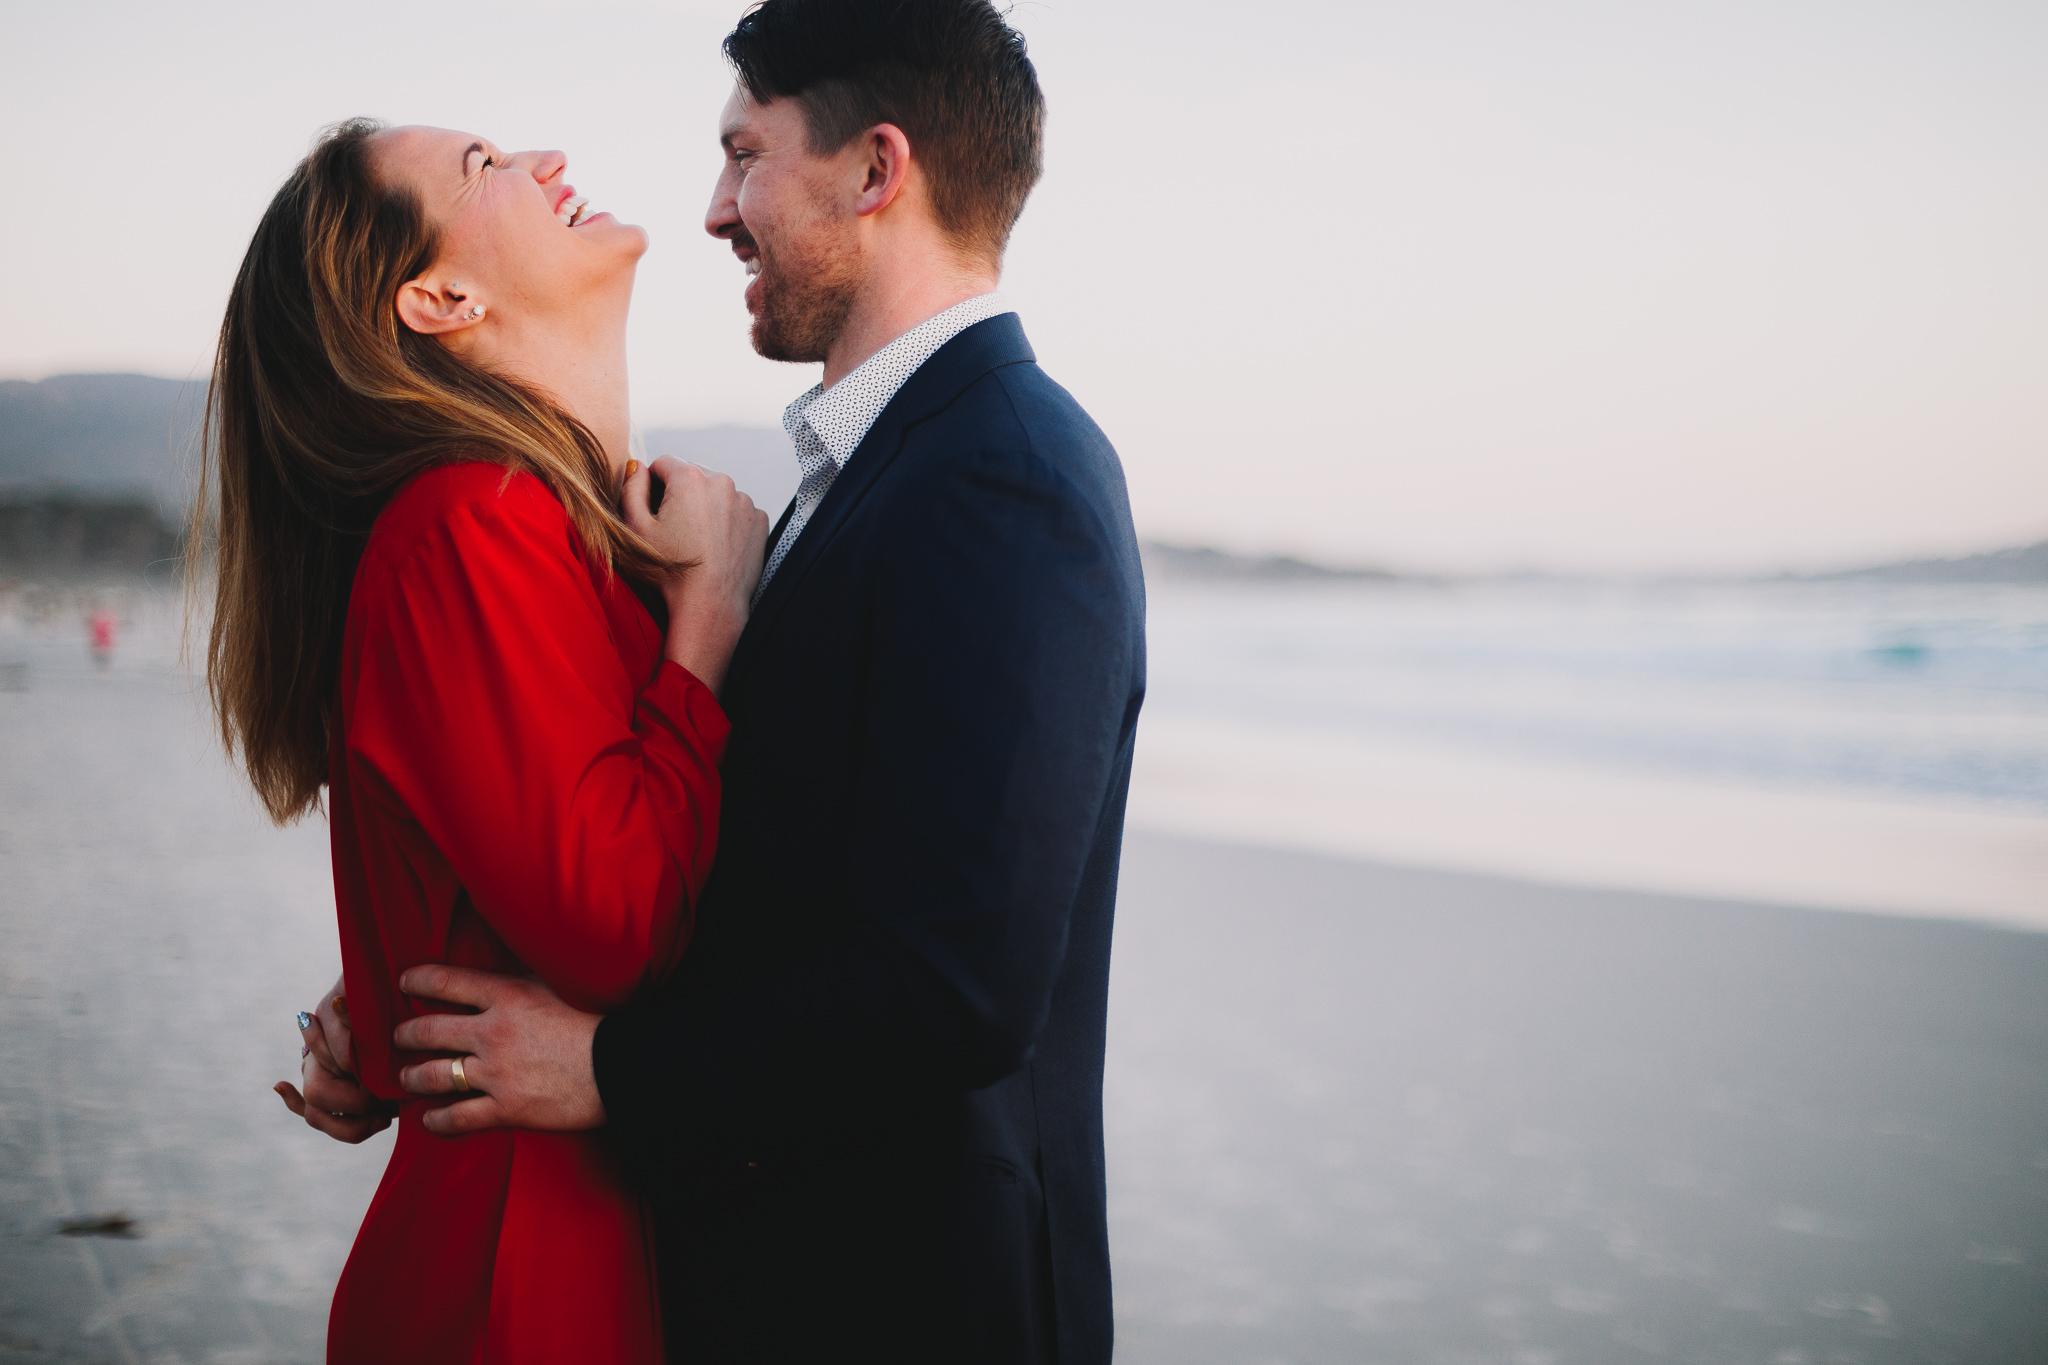 Archer Inspired Photography Carmel Beach California Wedding Engagement Lifestyle Anniversary Natural Light Photographer-106.jpg